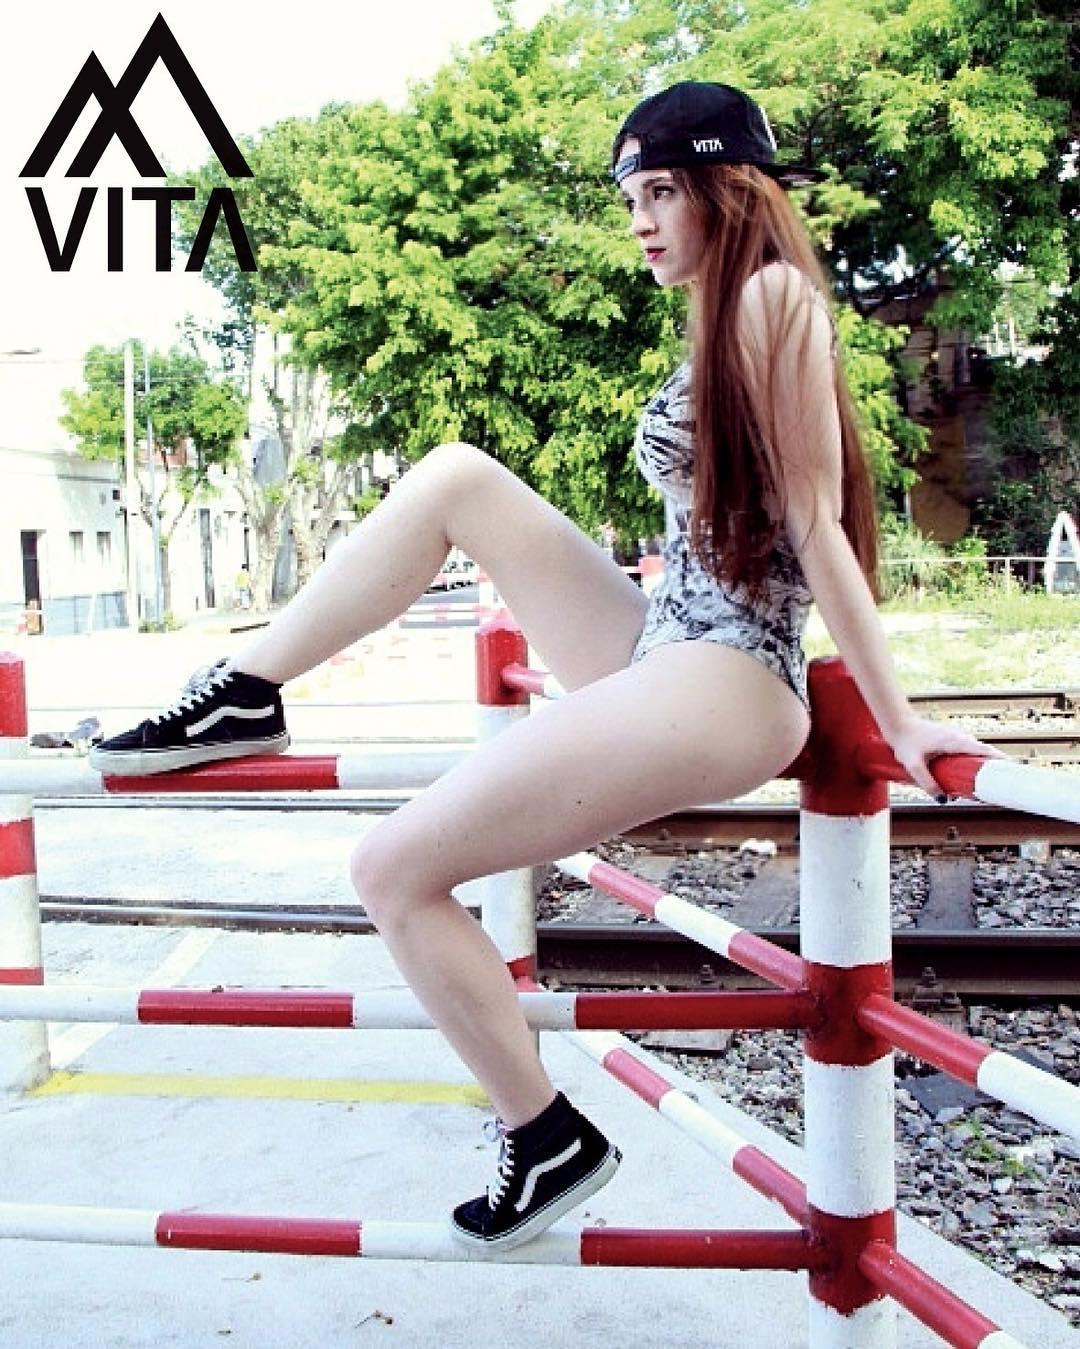 • | VITA StarWars de vuelta muy pronto |• @lulijota